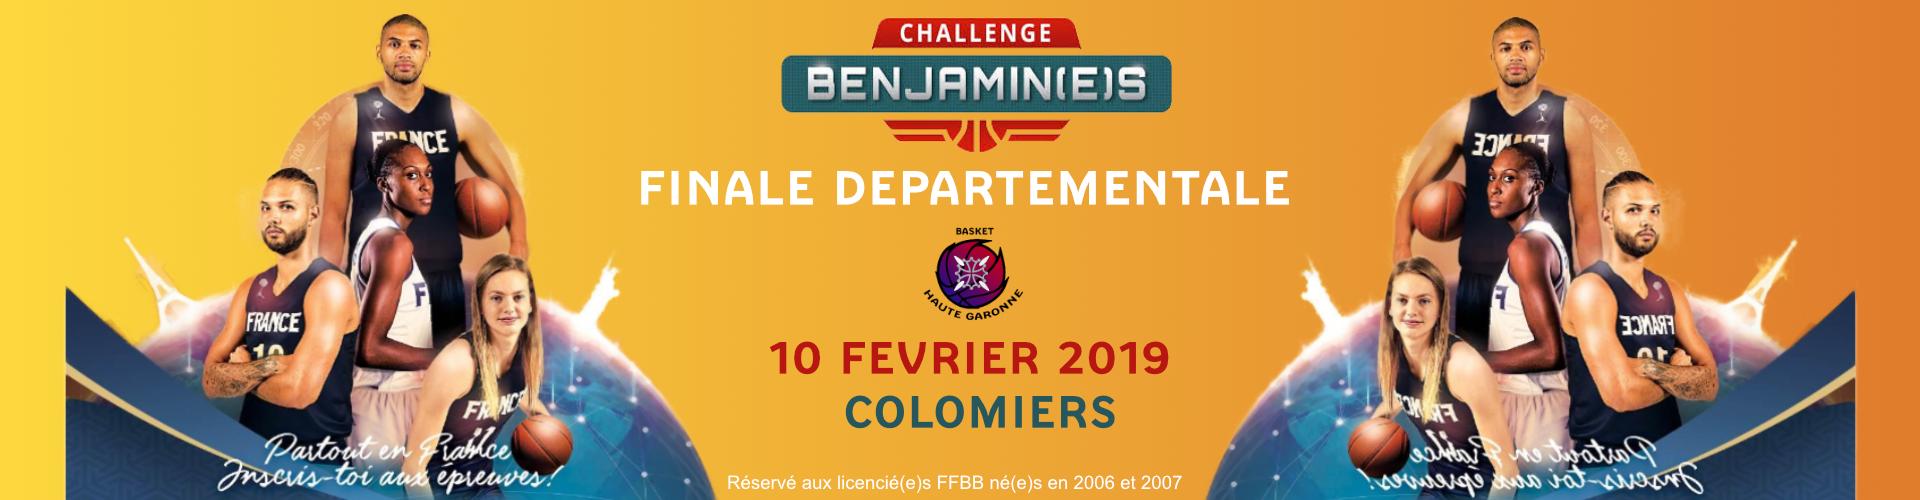 SLIDER-CHALLENGE-BENJAMINS-